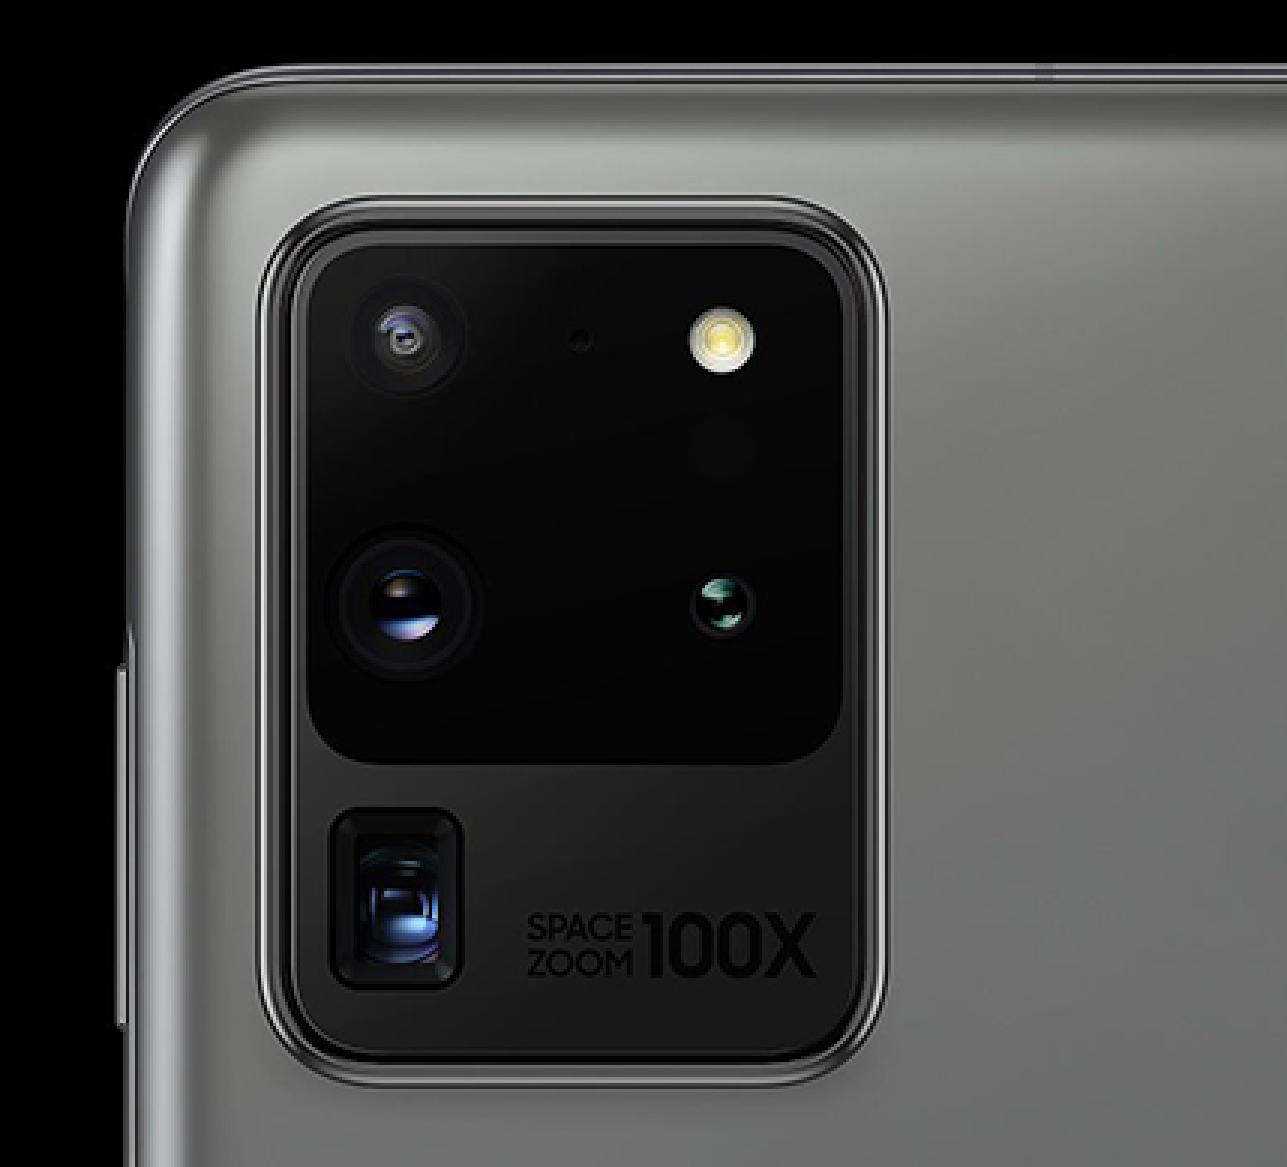 108MP camera on Galaxy S20 Ultra 5G